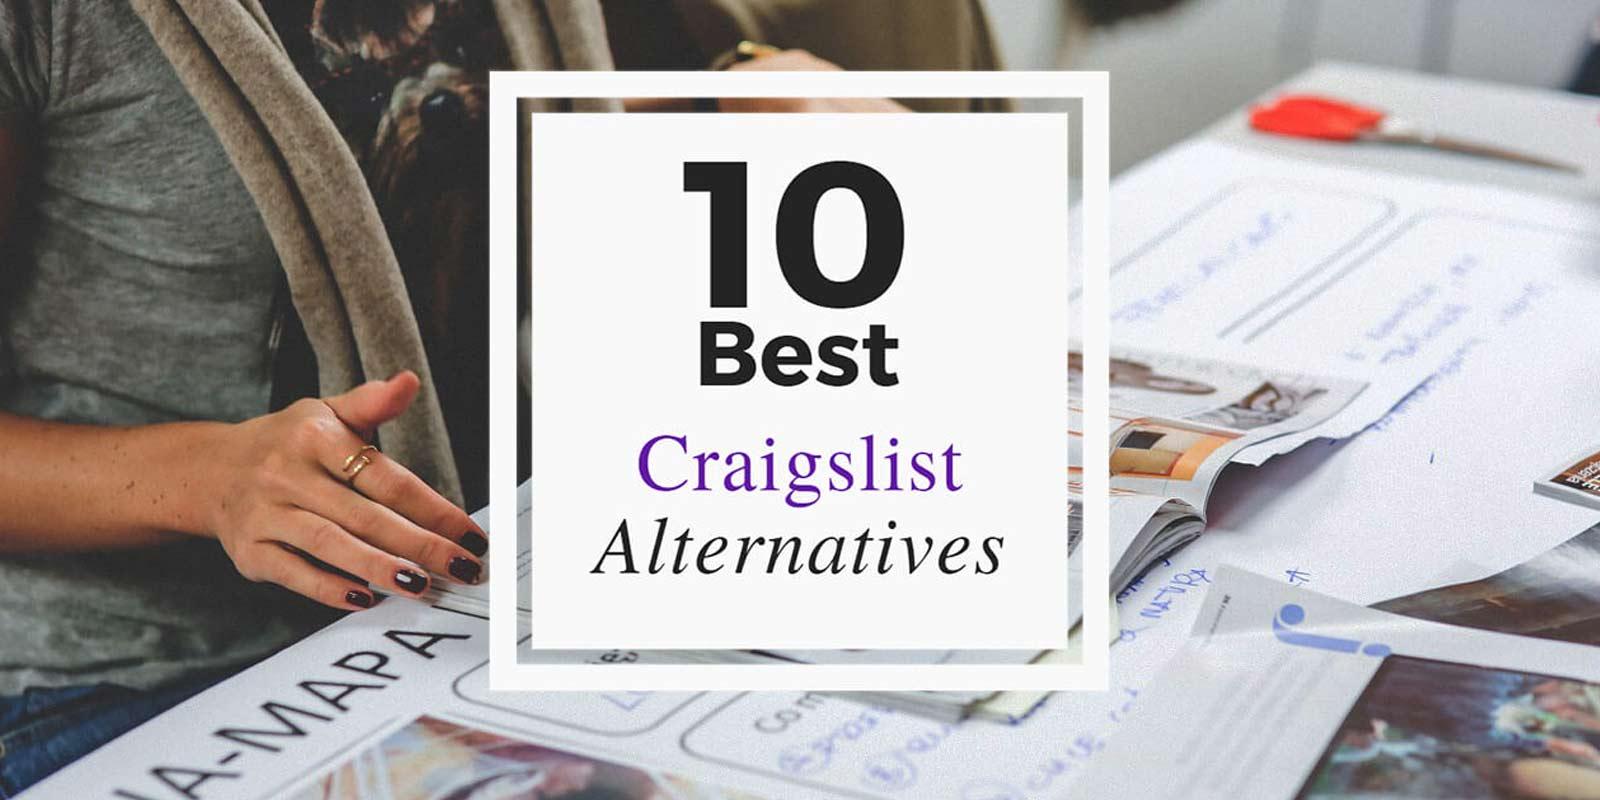 Top 10 Alternatives to Craigslist, Sites Similar to Craigslist